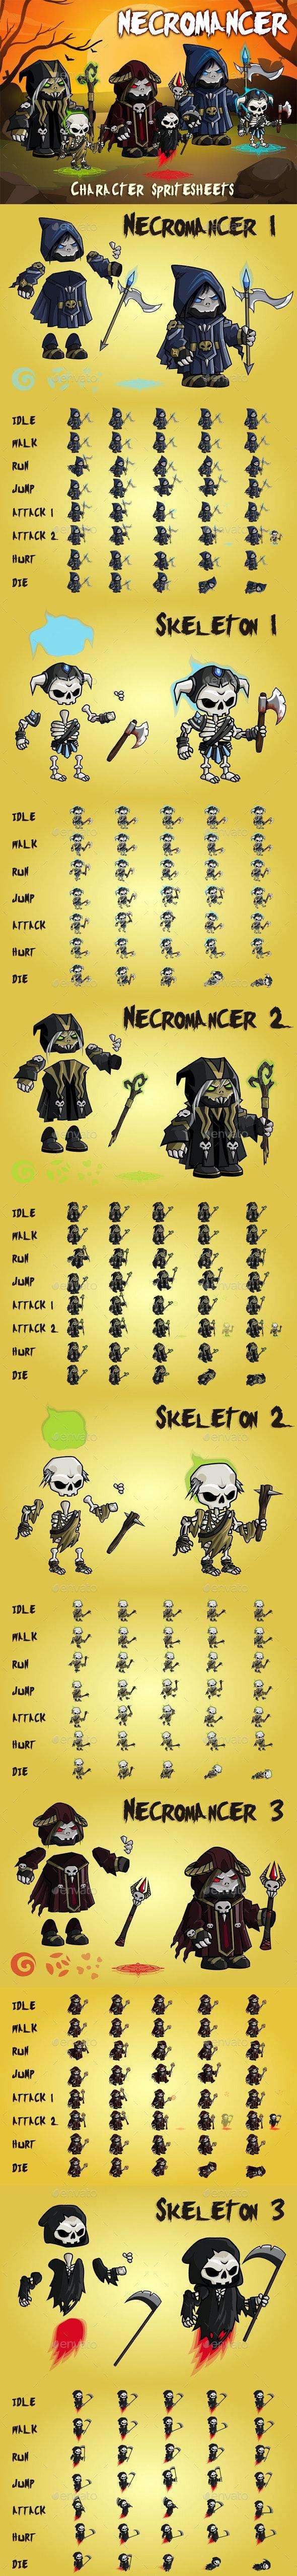 Necromancer 2D Game Character Sprite Sheet - Sprites Game Assets